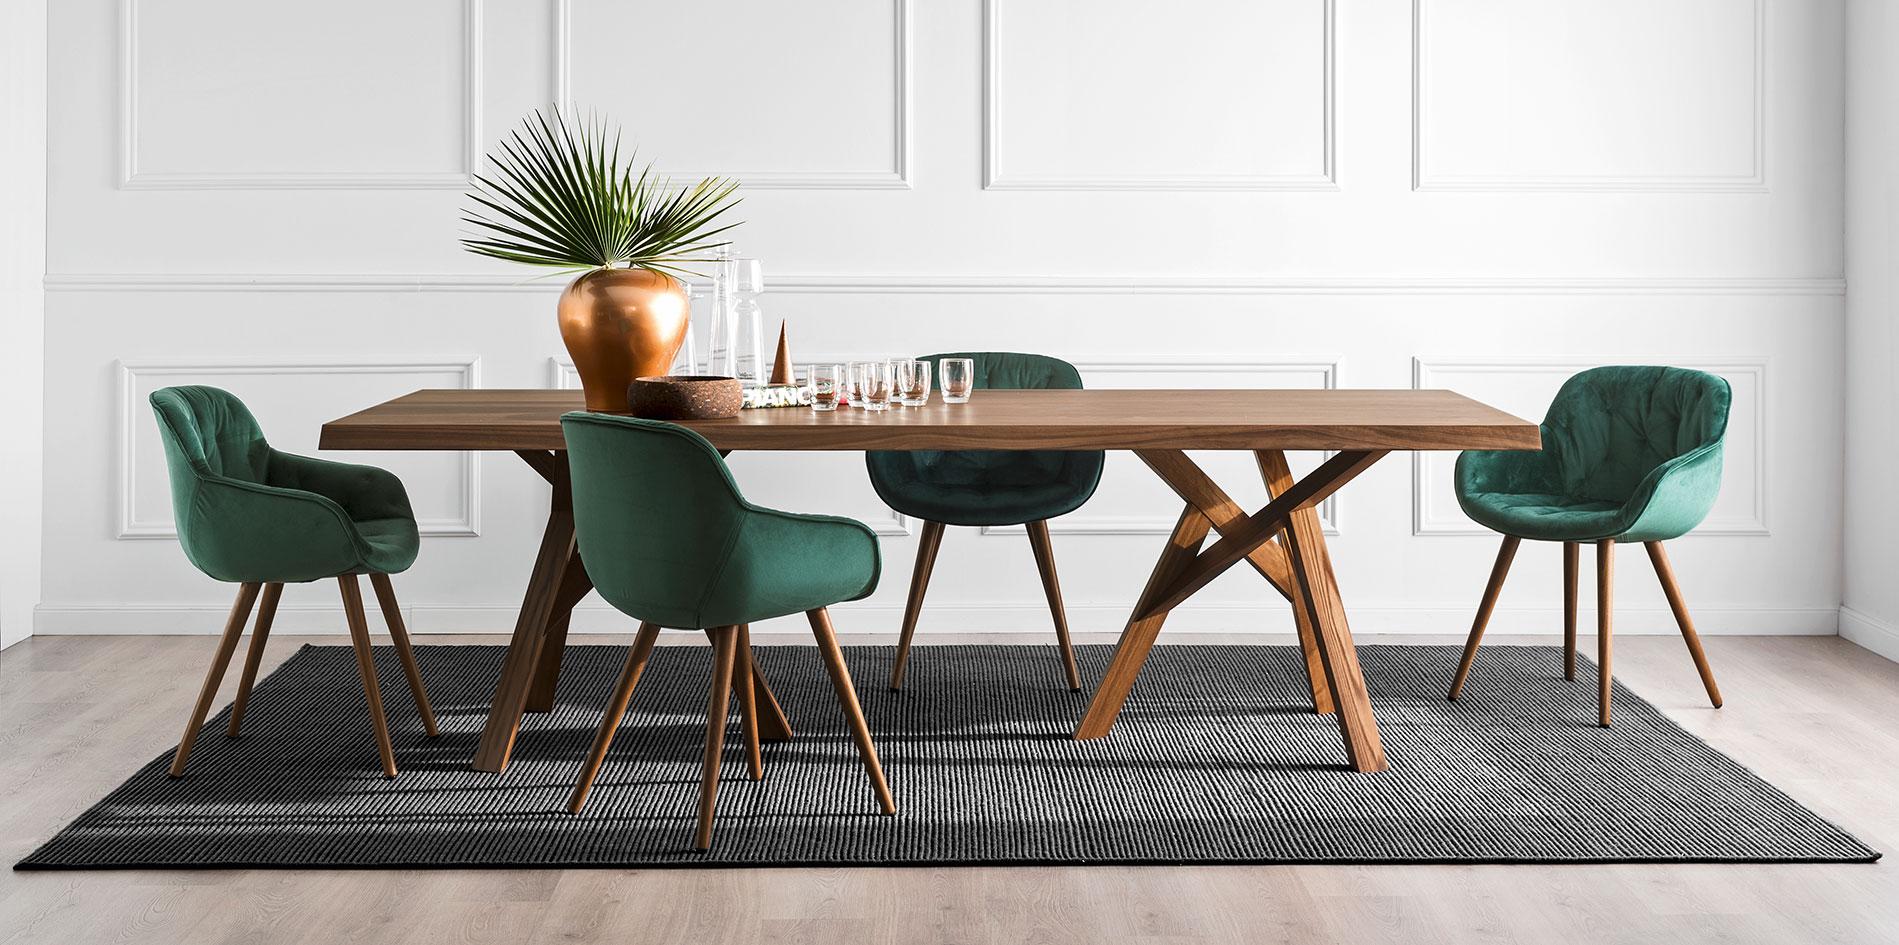 Voyager Furniture Interiors Homewares Sofas Tables